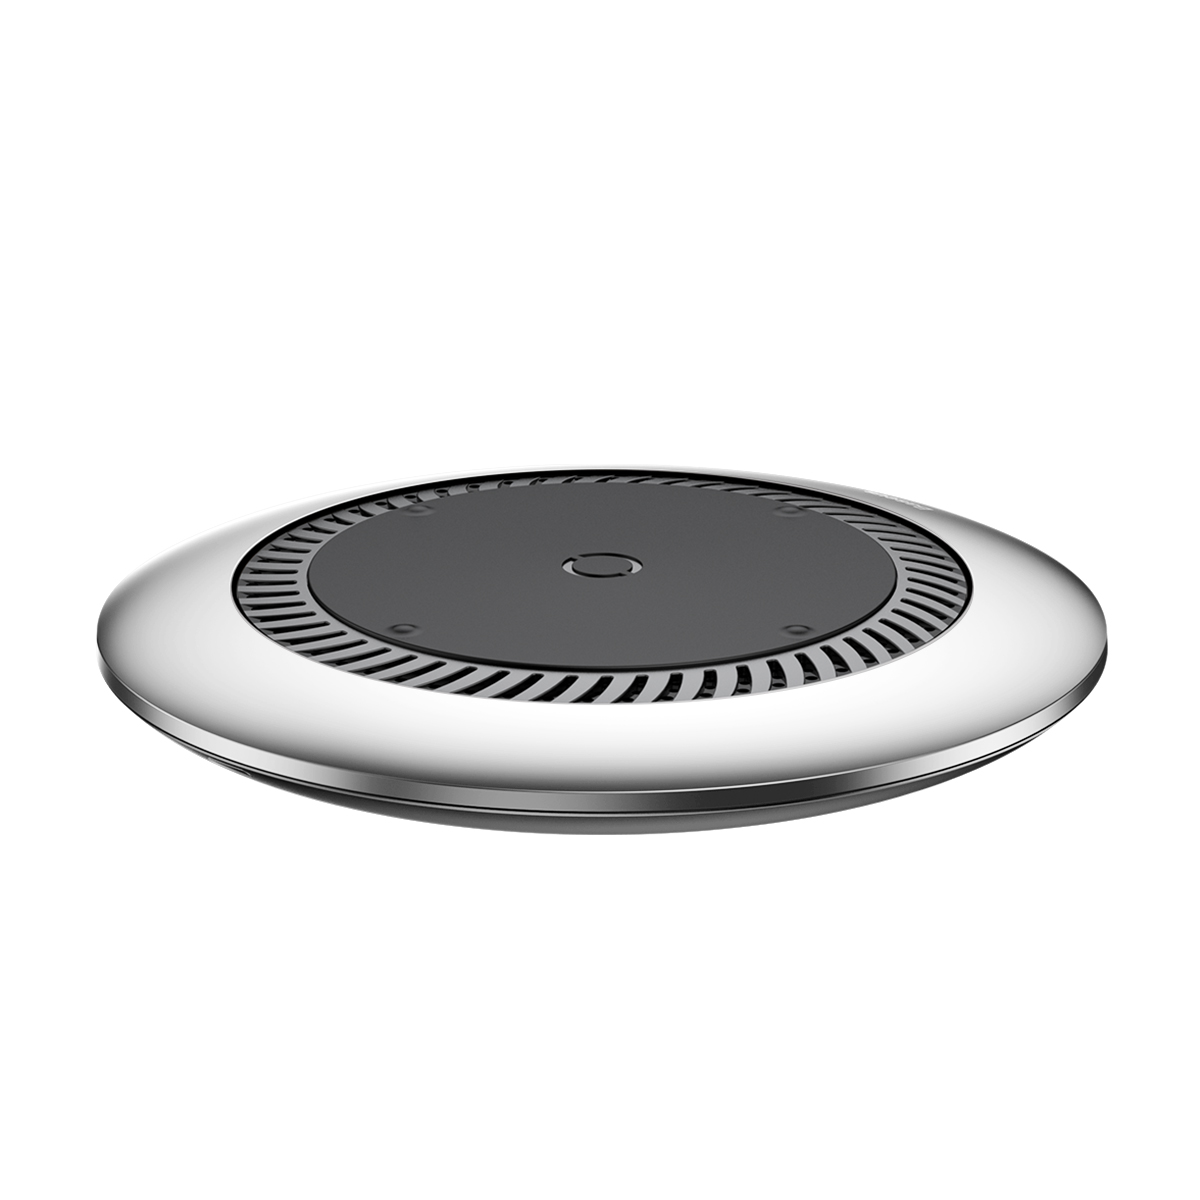 Беспроводное зарядное устройство Baseus whirlwind Desktop wireless charger Silver зарядное